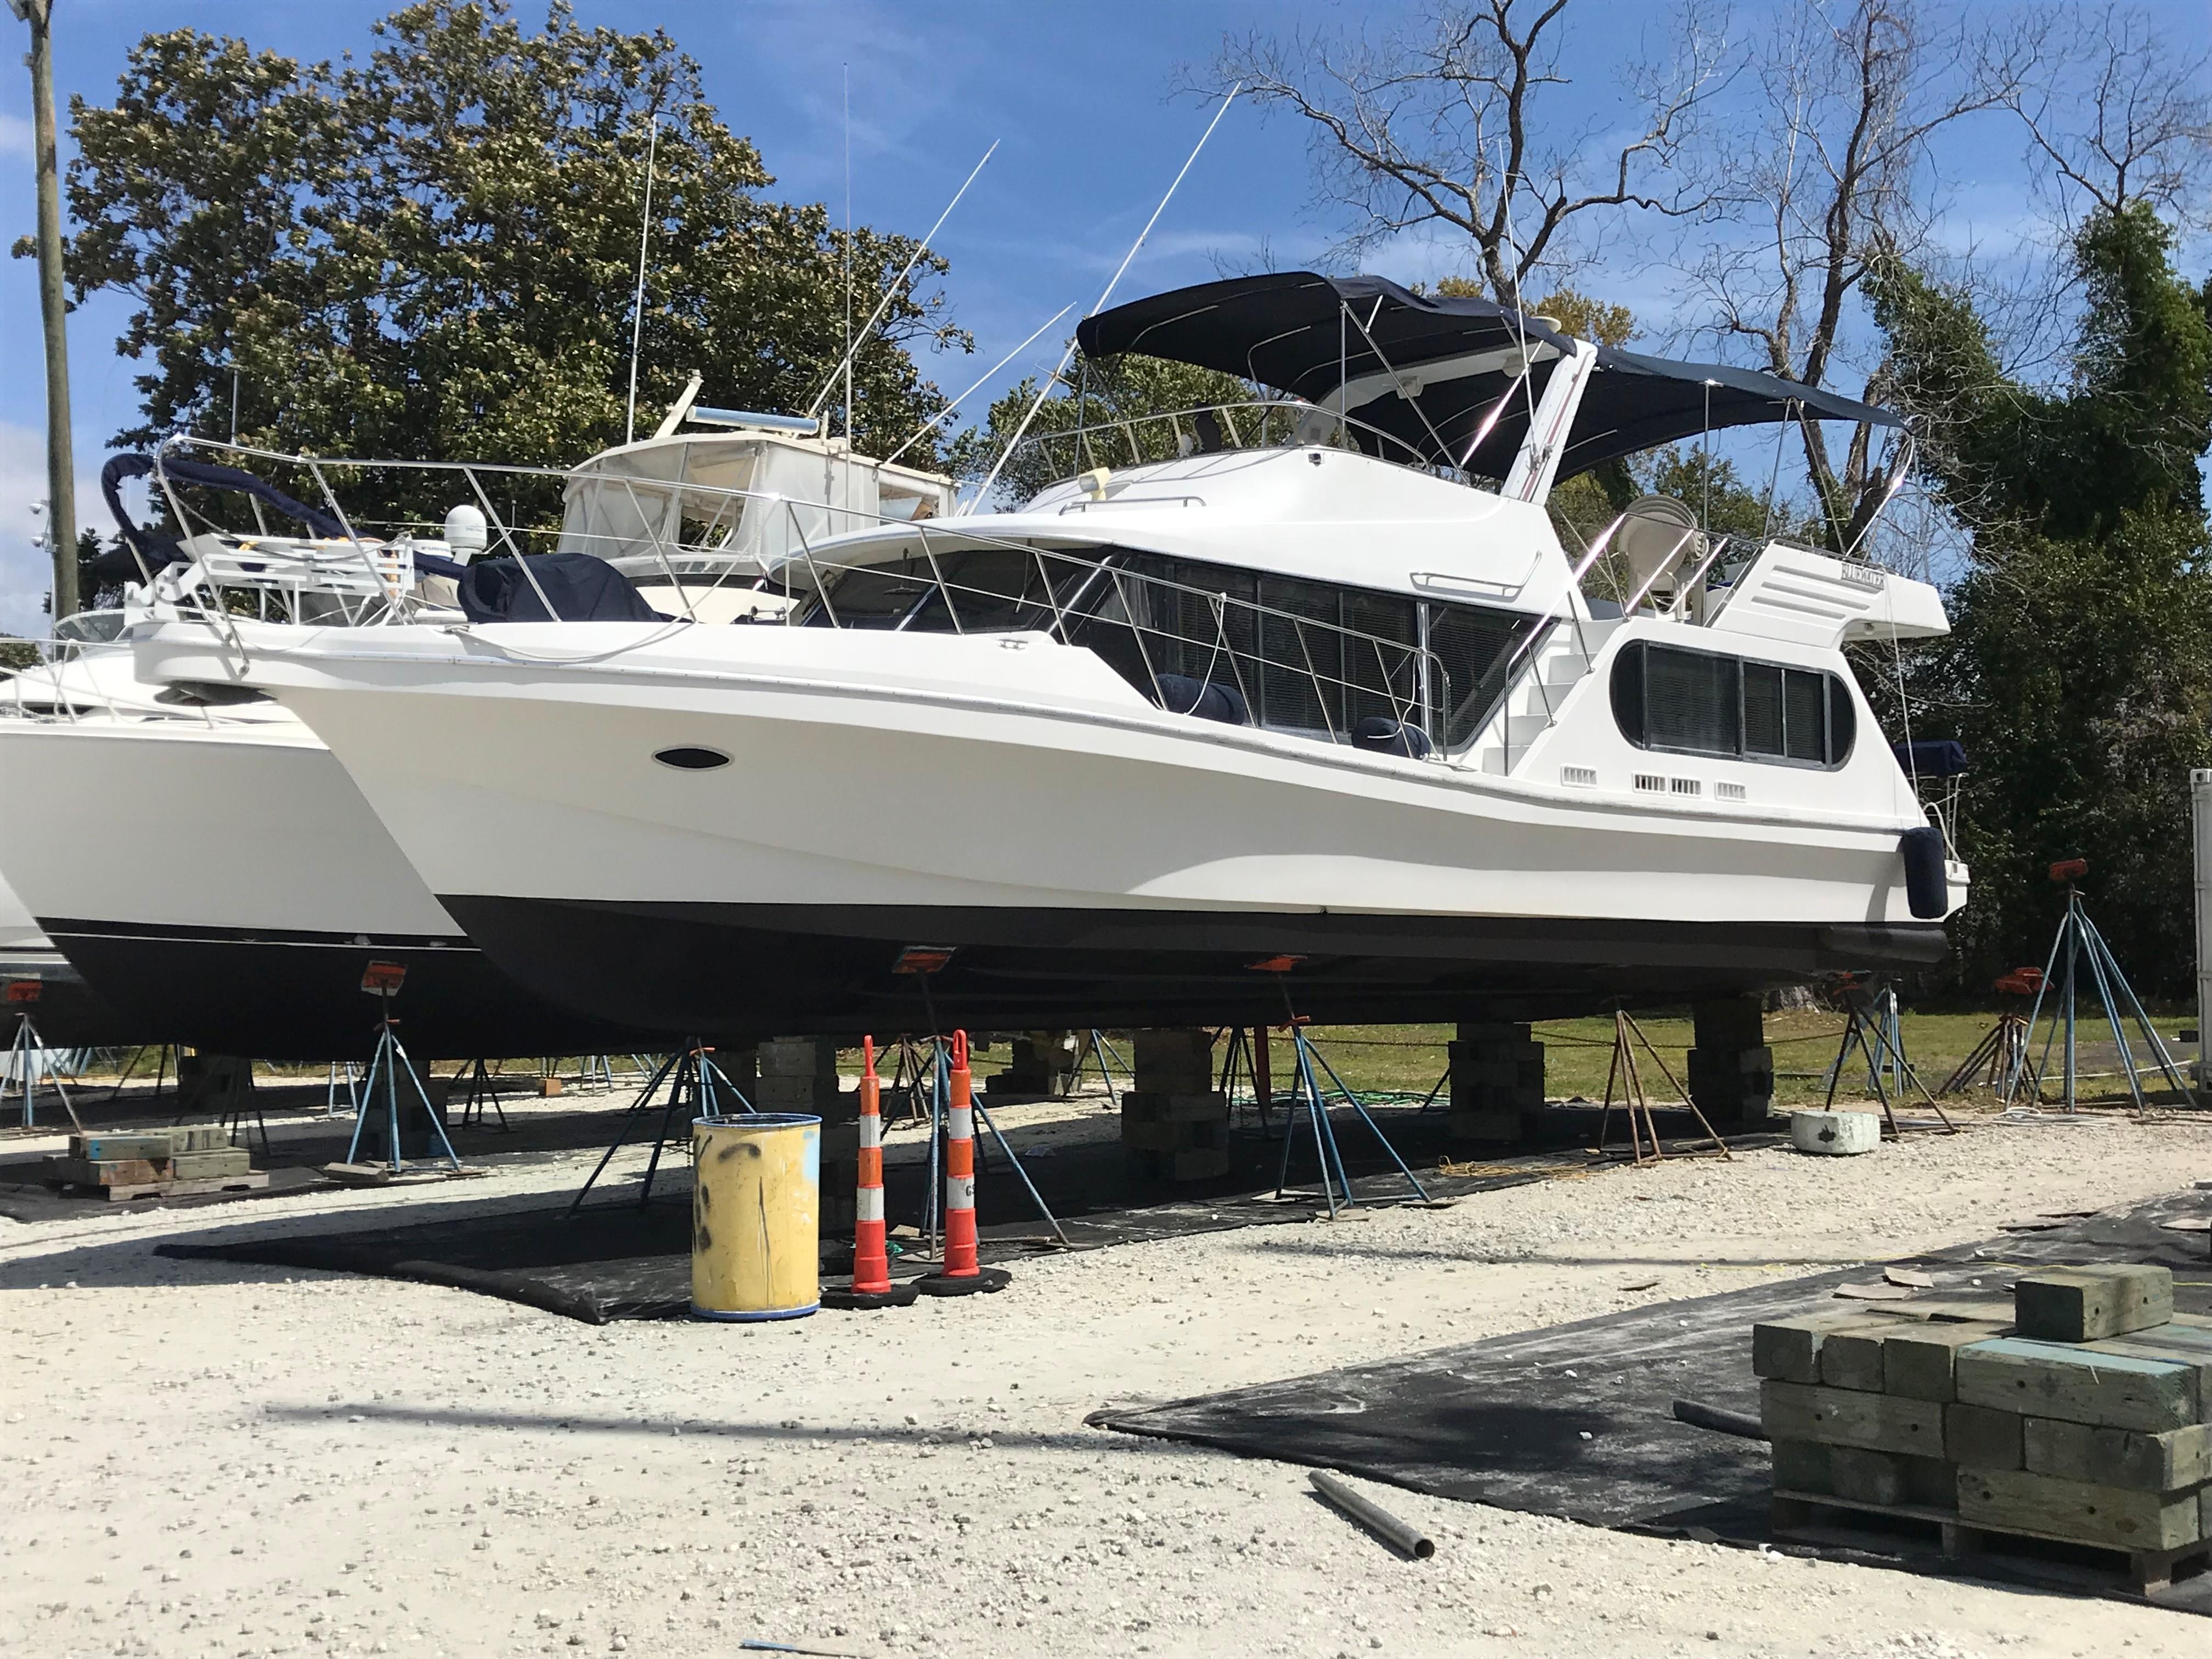 Bluewater Yachts 48 Houseboat - Fresh Bottom Paint